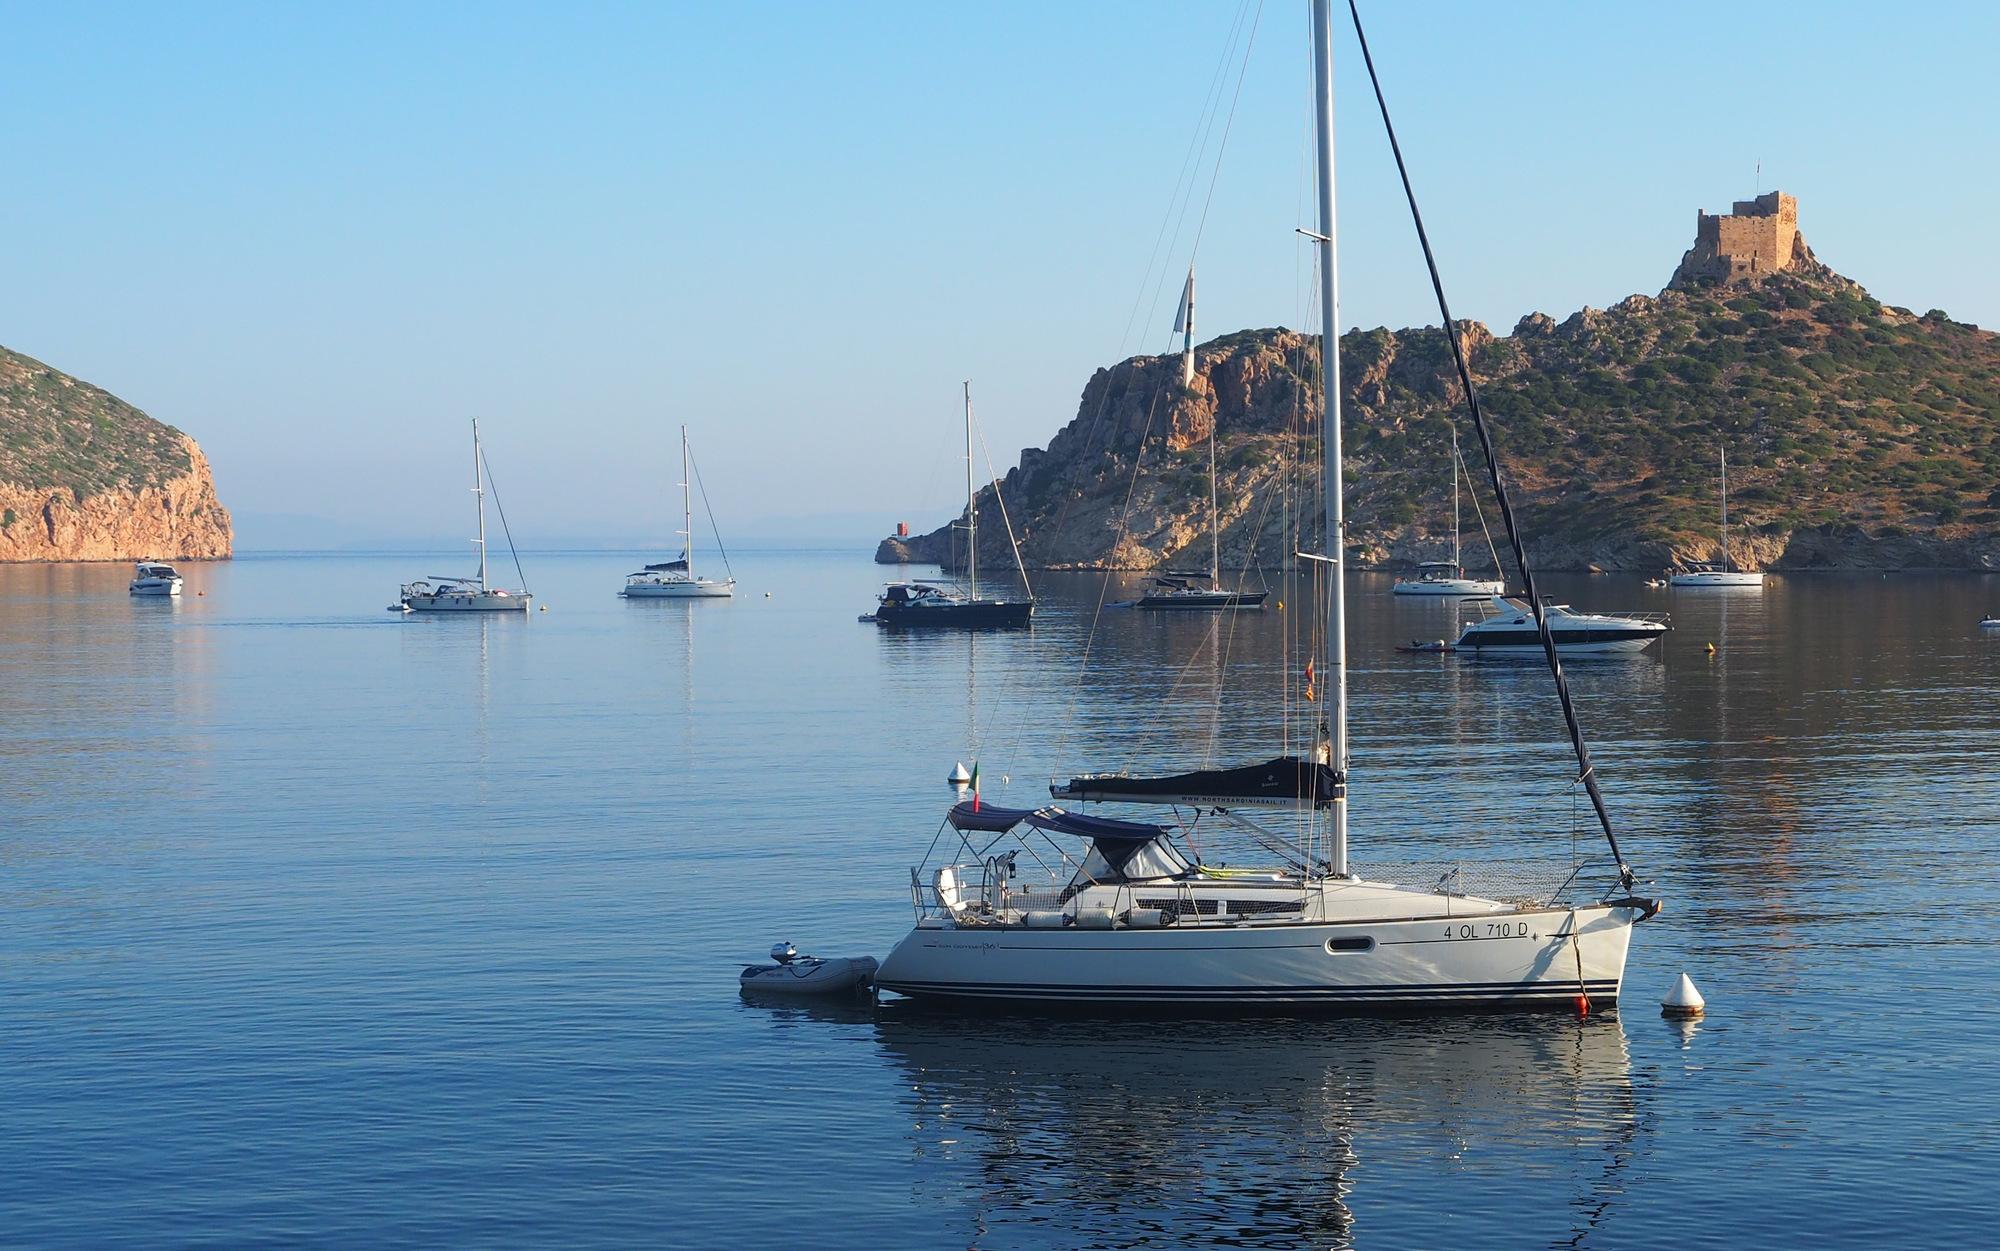 Mariner Boating Holidays - tying to a buoy.